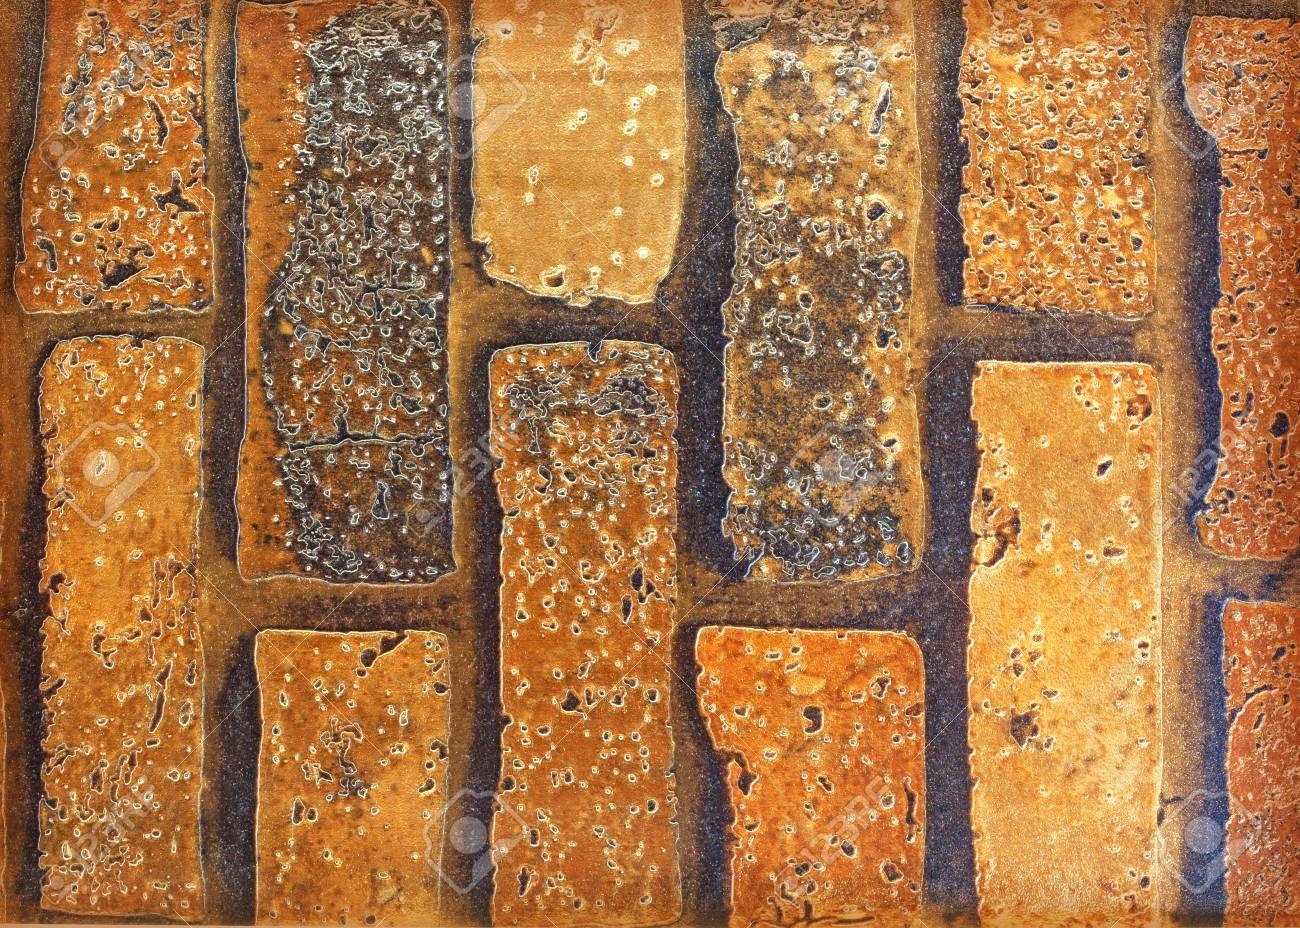 Carta Da Parati Tessuto eccellente seamless sfondo floreale carta da parati, tessuto muro.